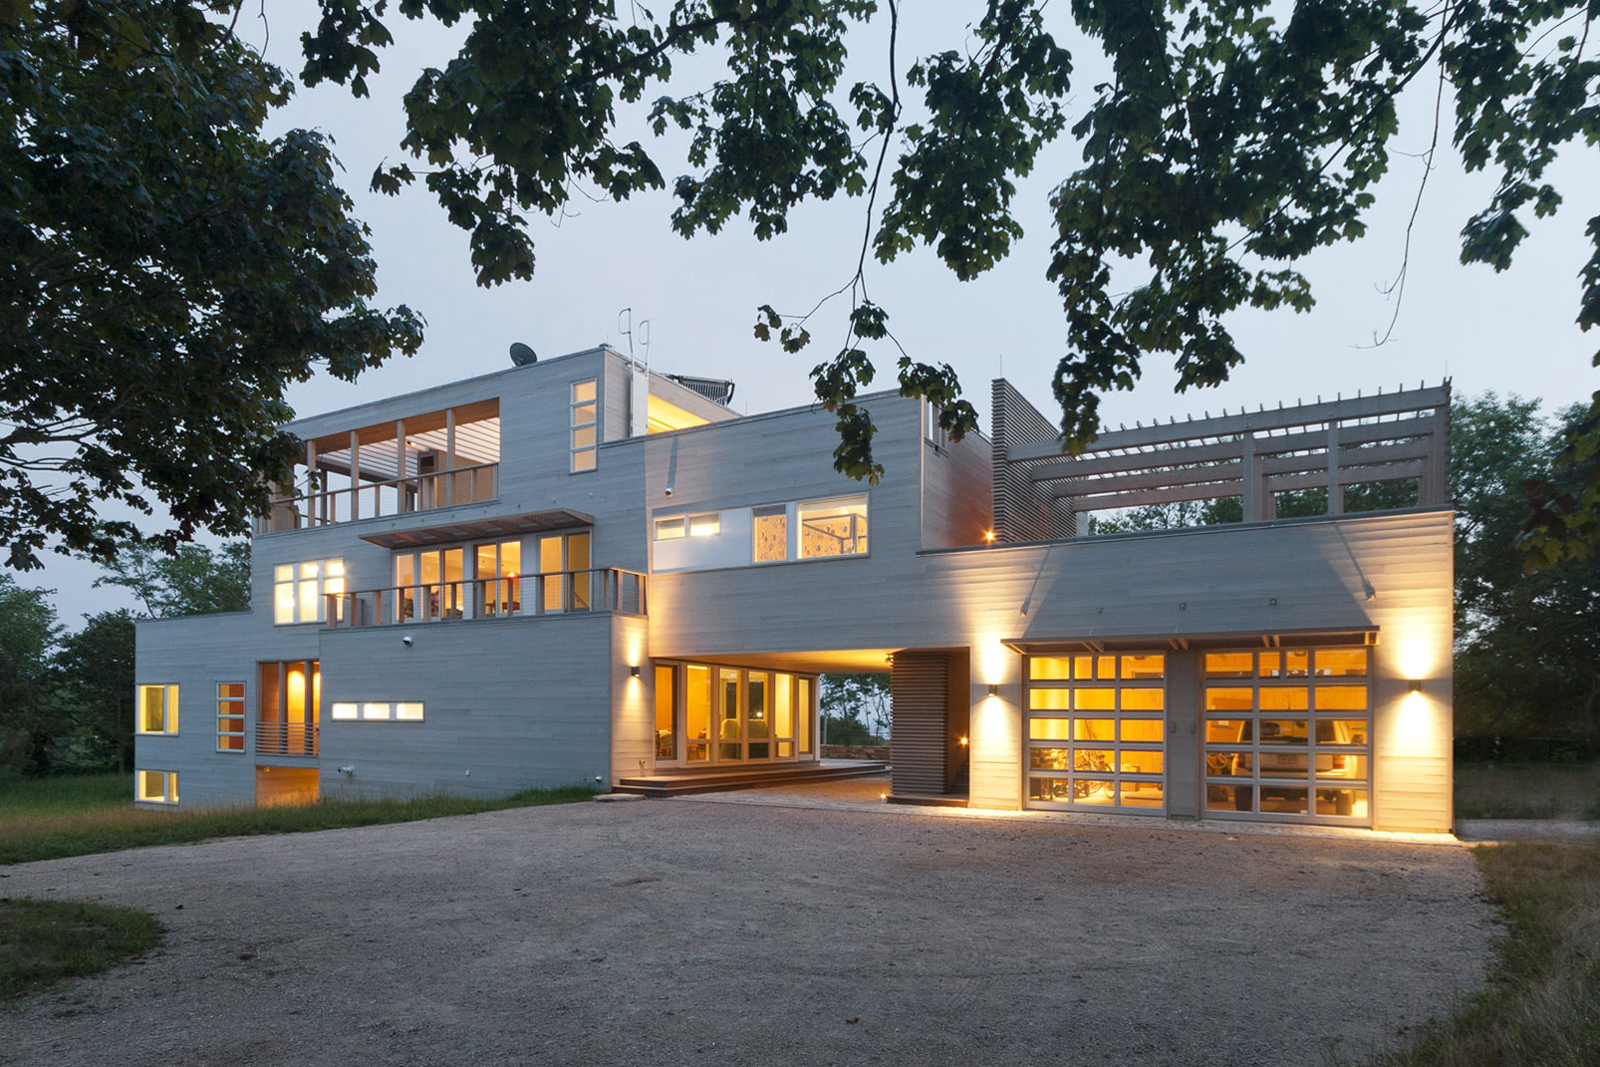 28-res4-resolution-4-architecture-modern-modular-home-prefab-house-fishers-island-exterior.jpg